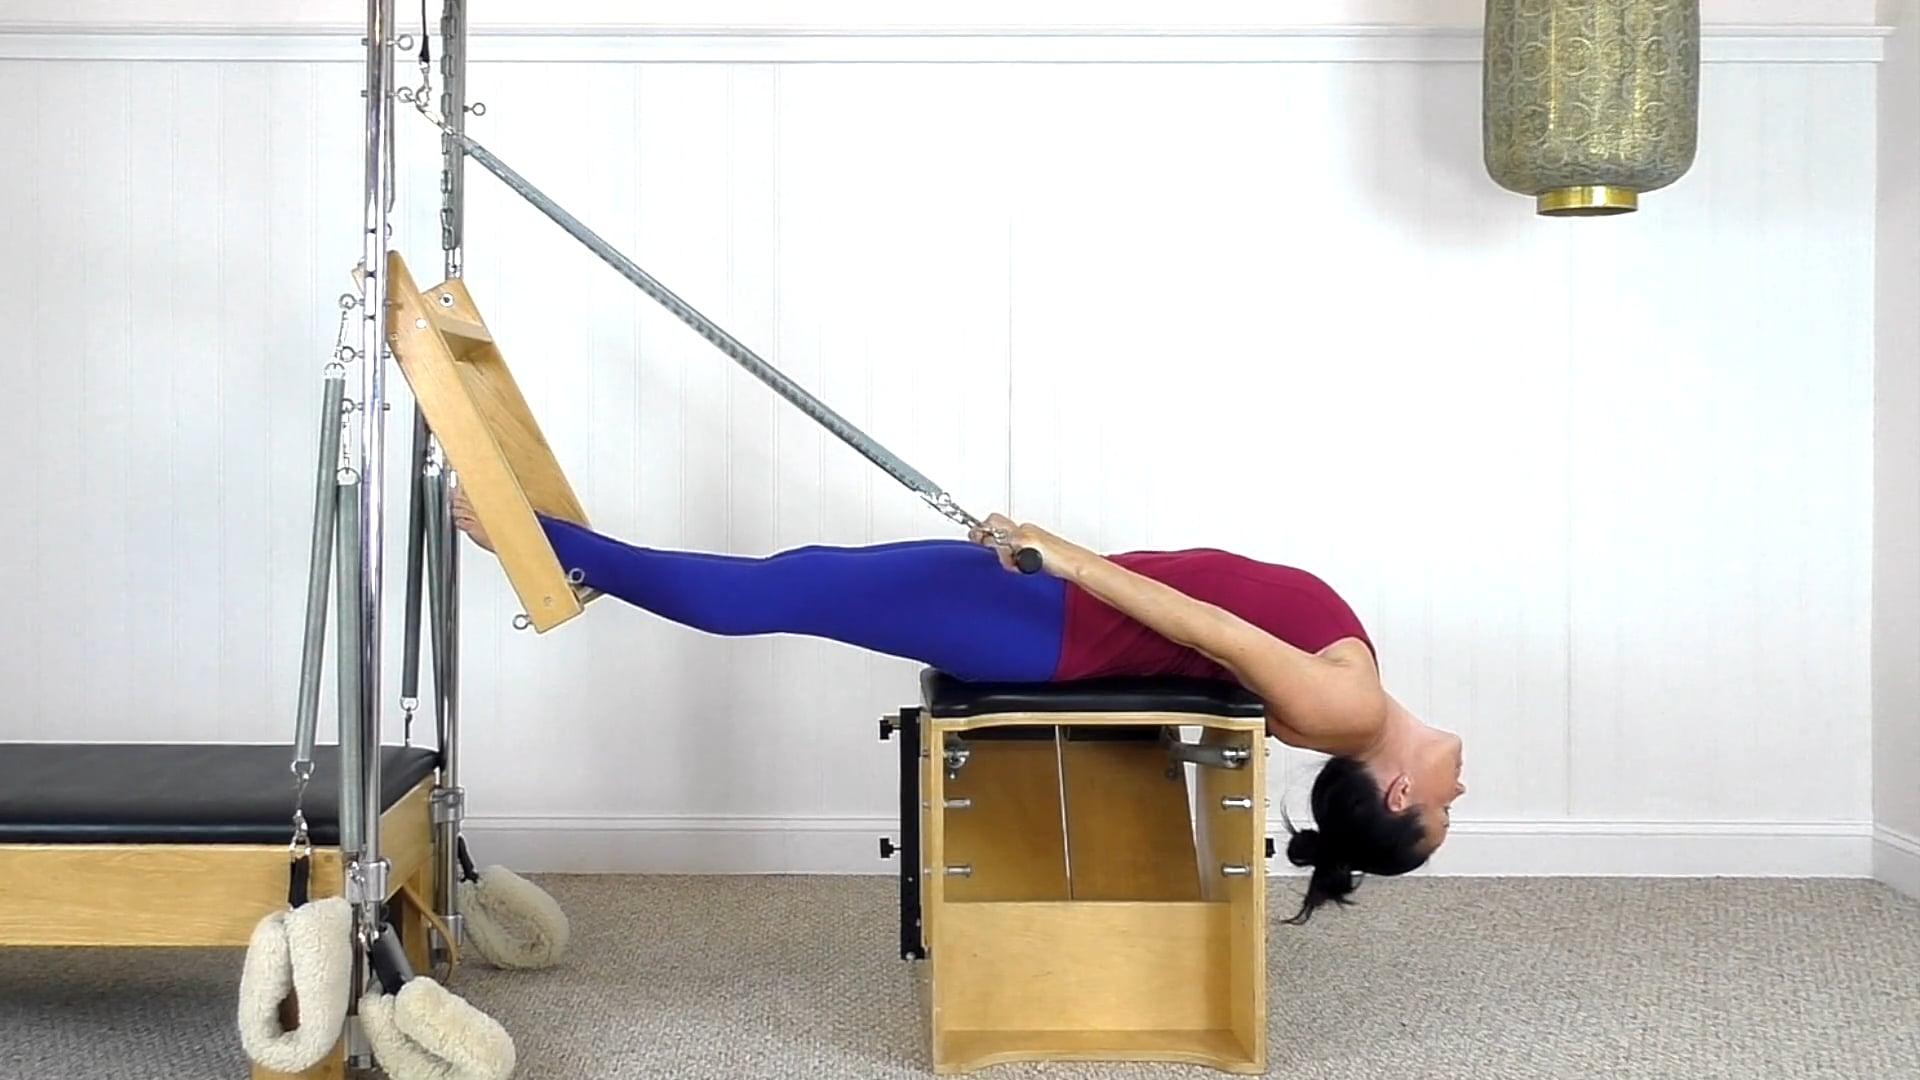 Tower/Wunda Chair Class (41 mins)